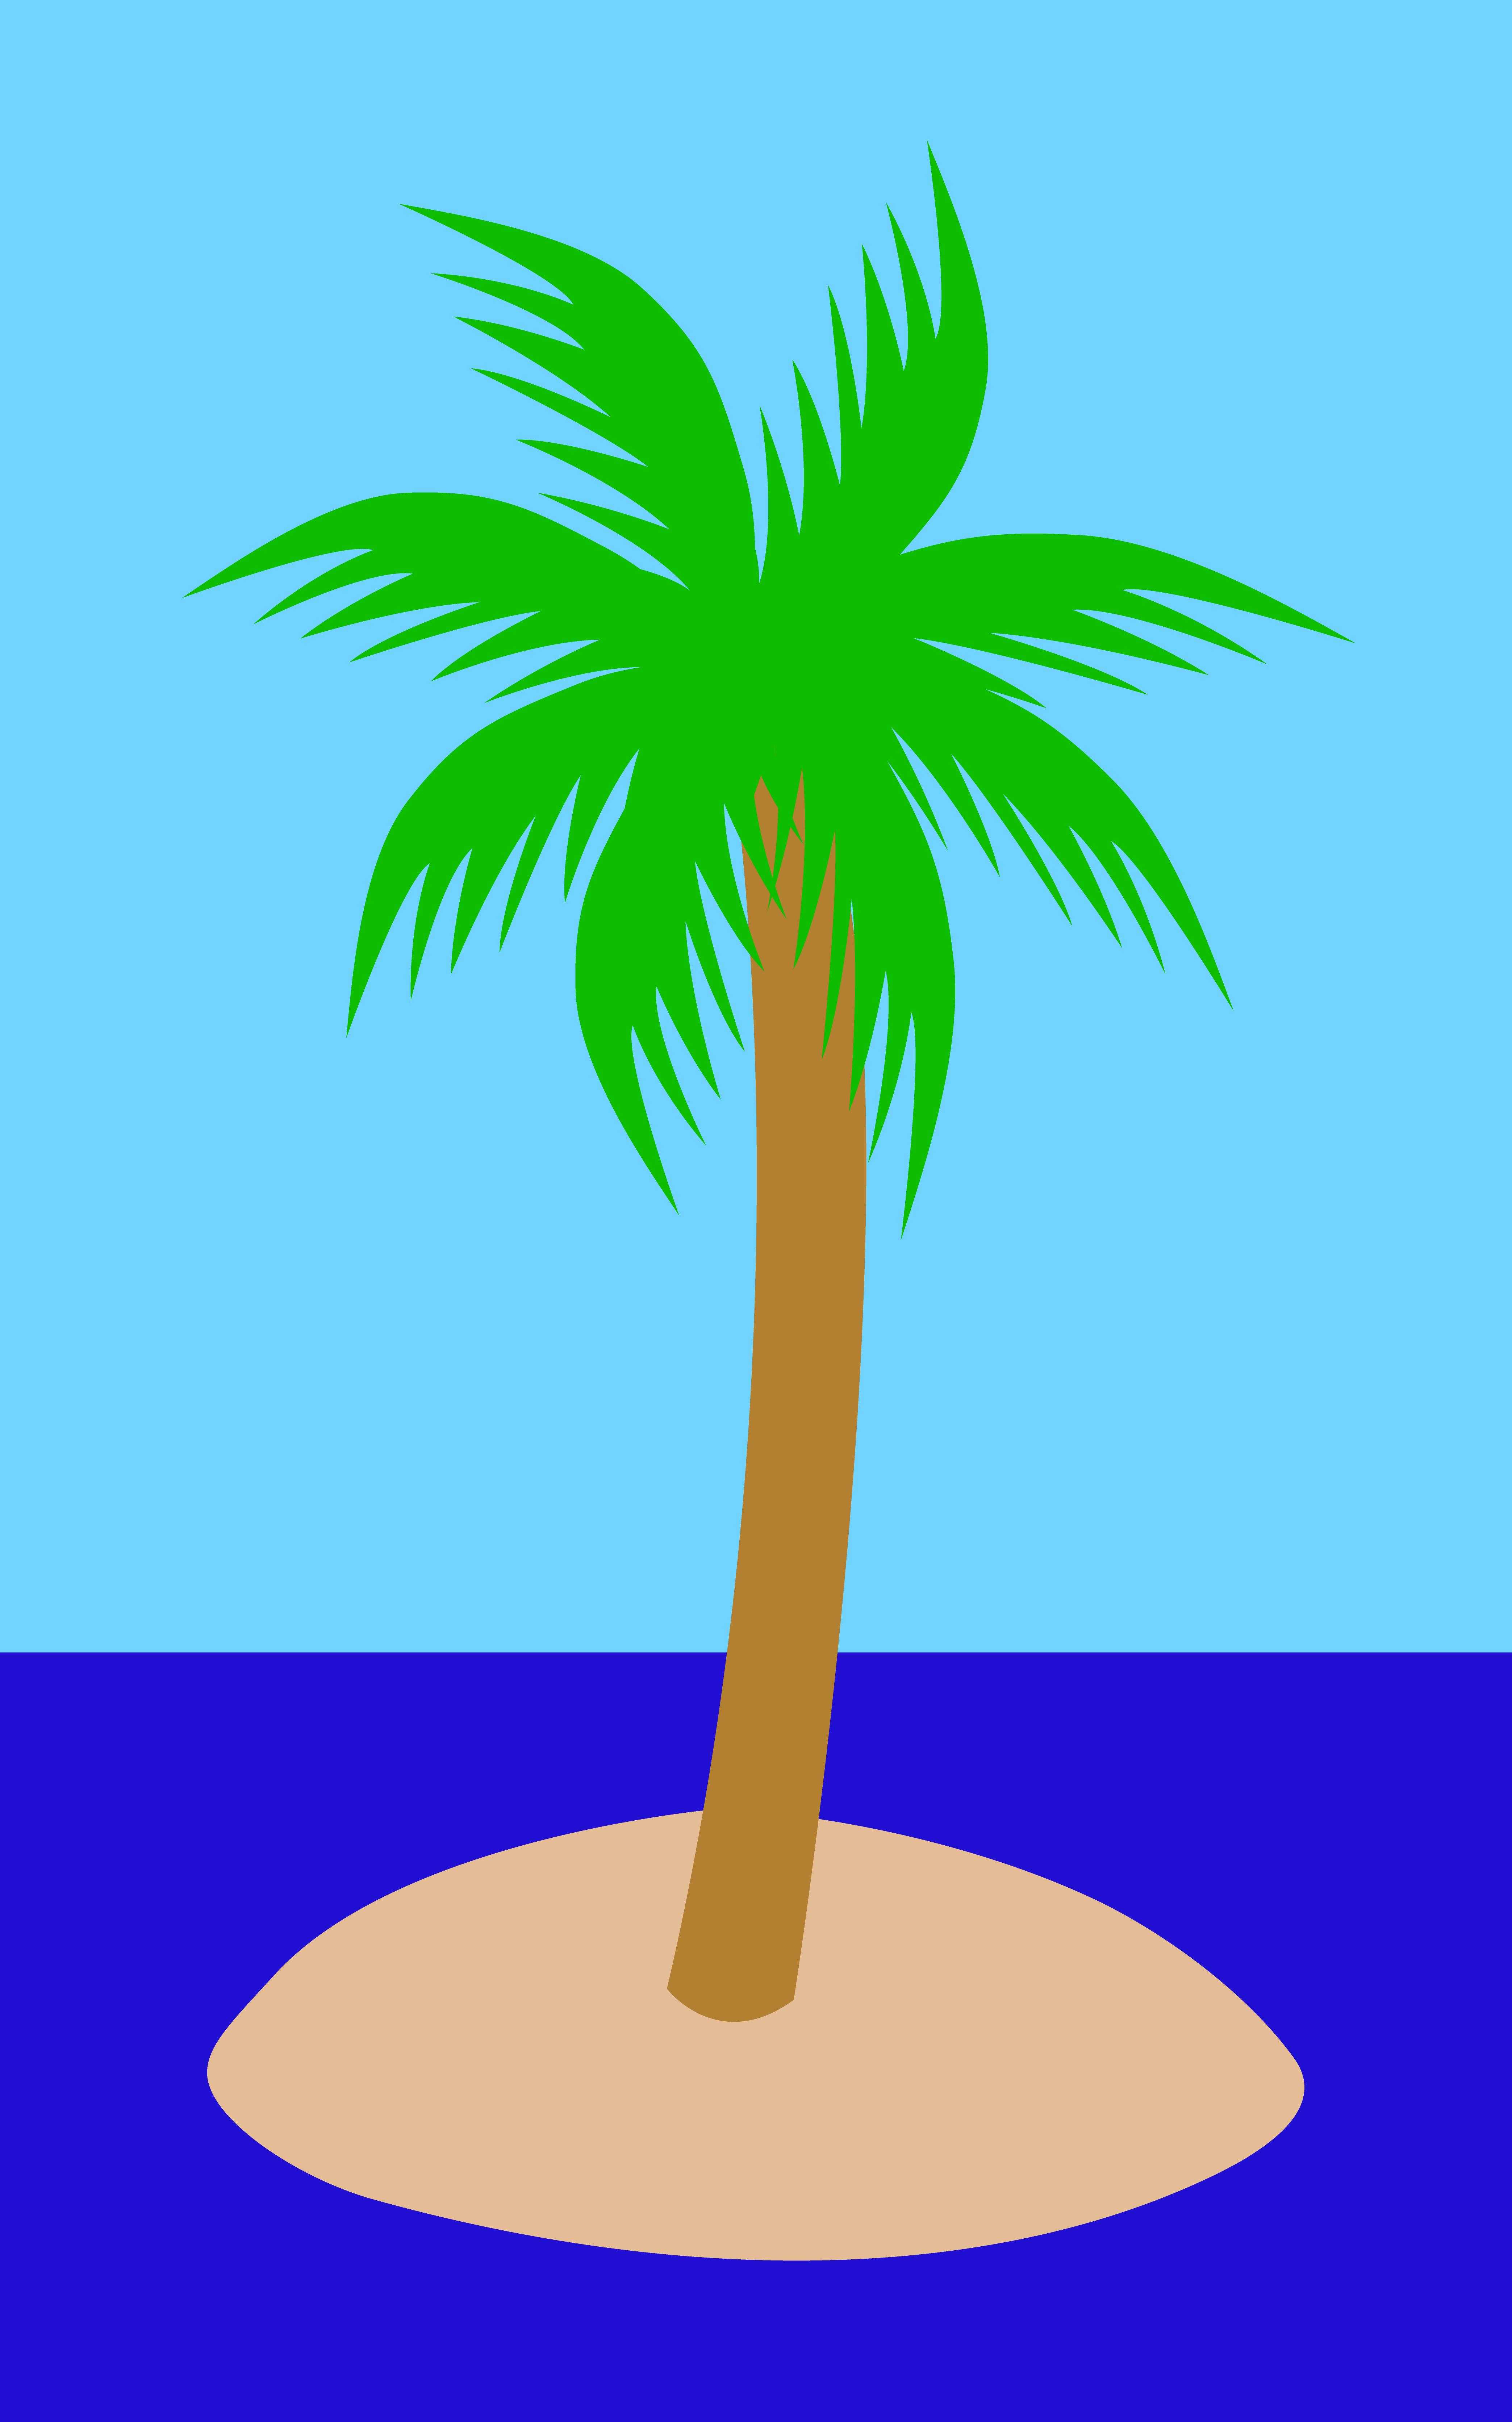 Palm tree ocean clipart.